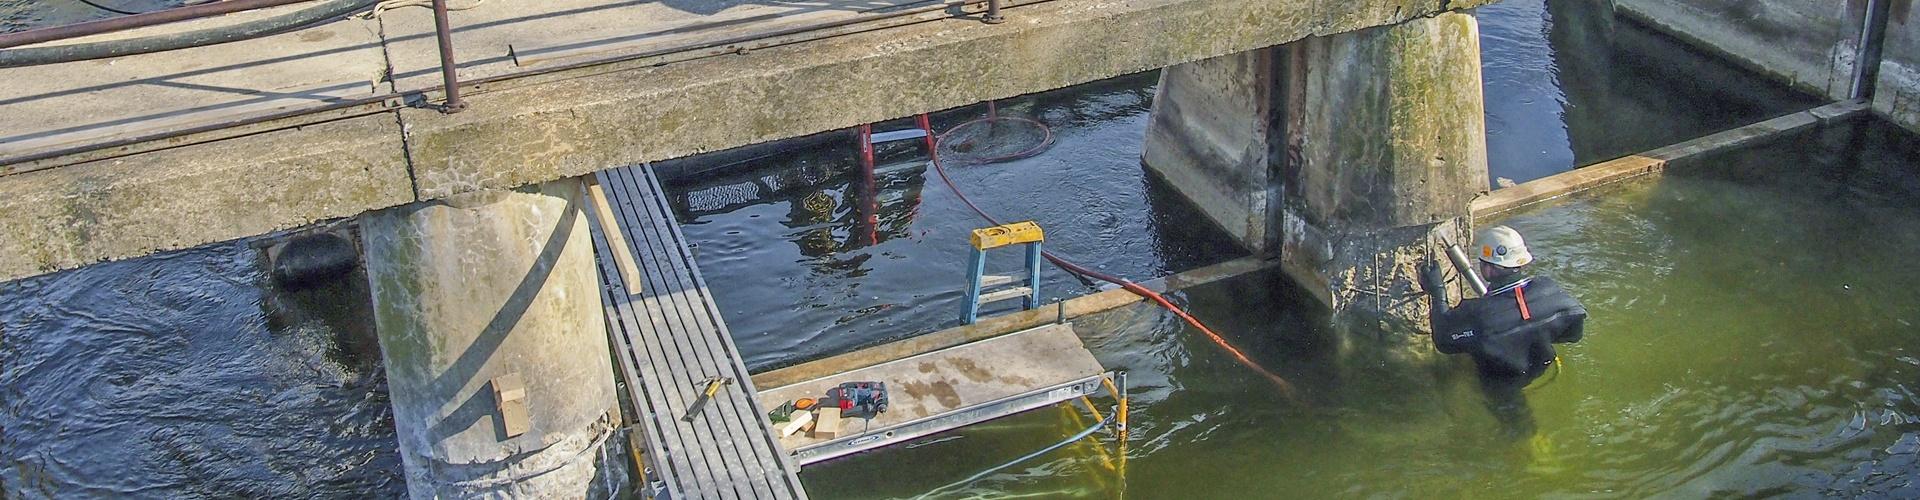 preplaced aggregate concrete, dam repairs, brennan, underwater concrete repairs, concrete repairs, dam pier repairs, surface repairs